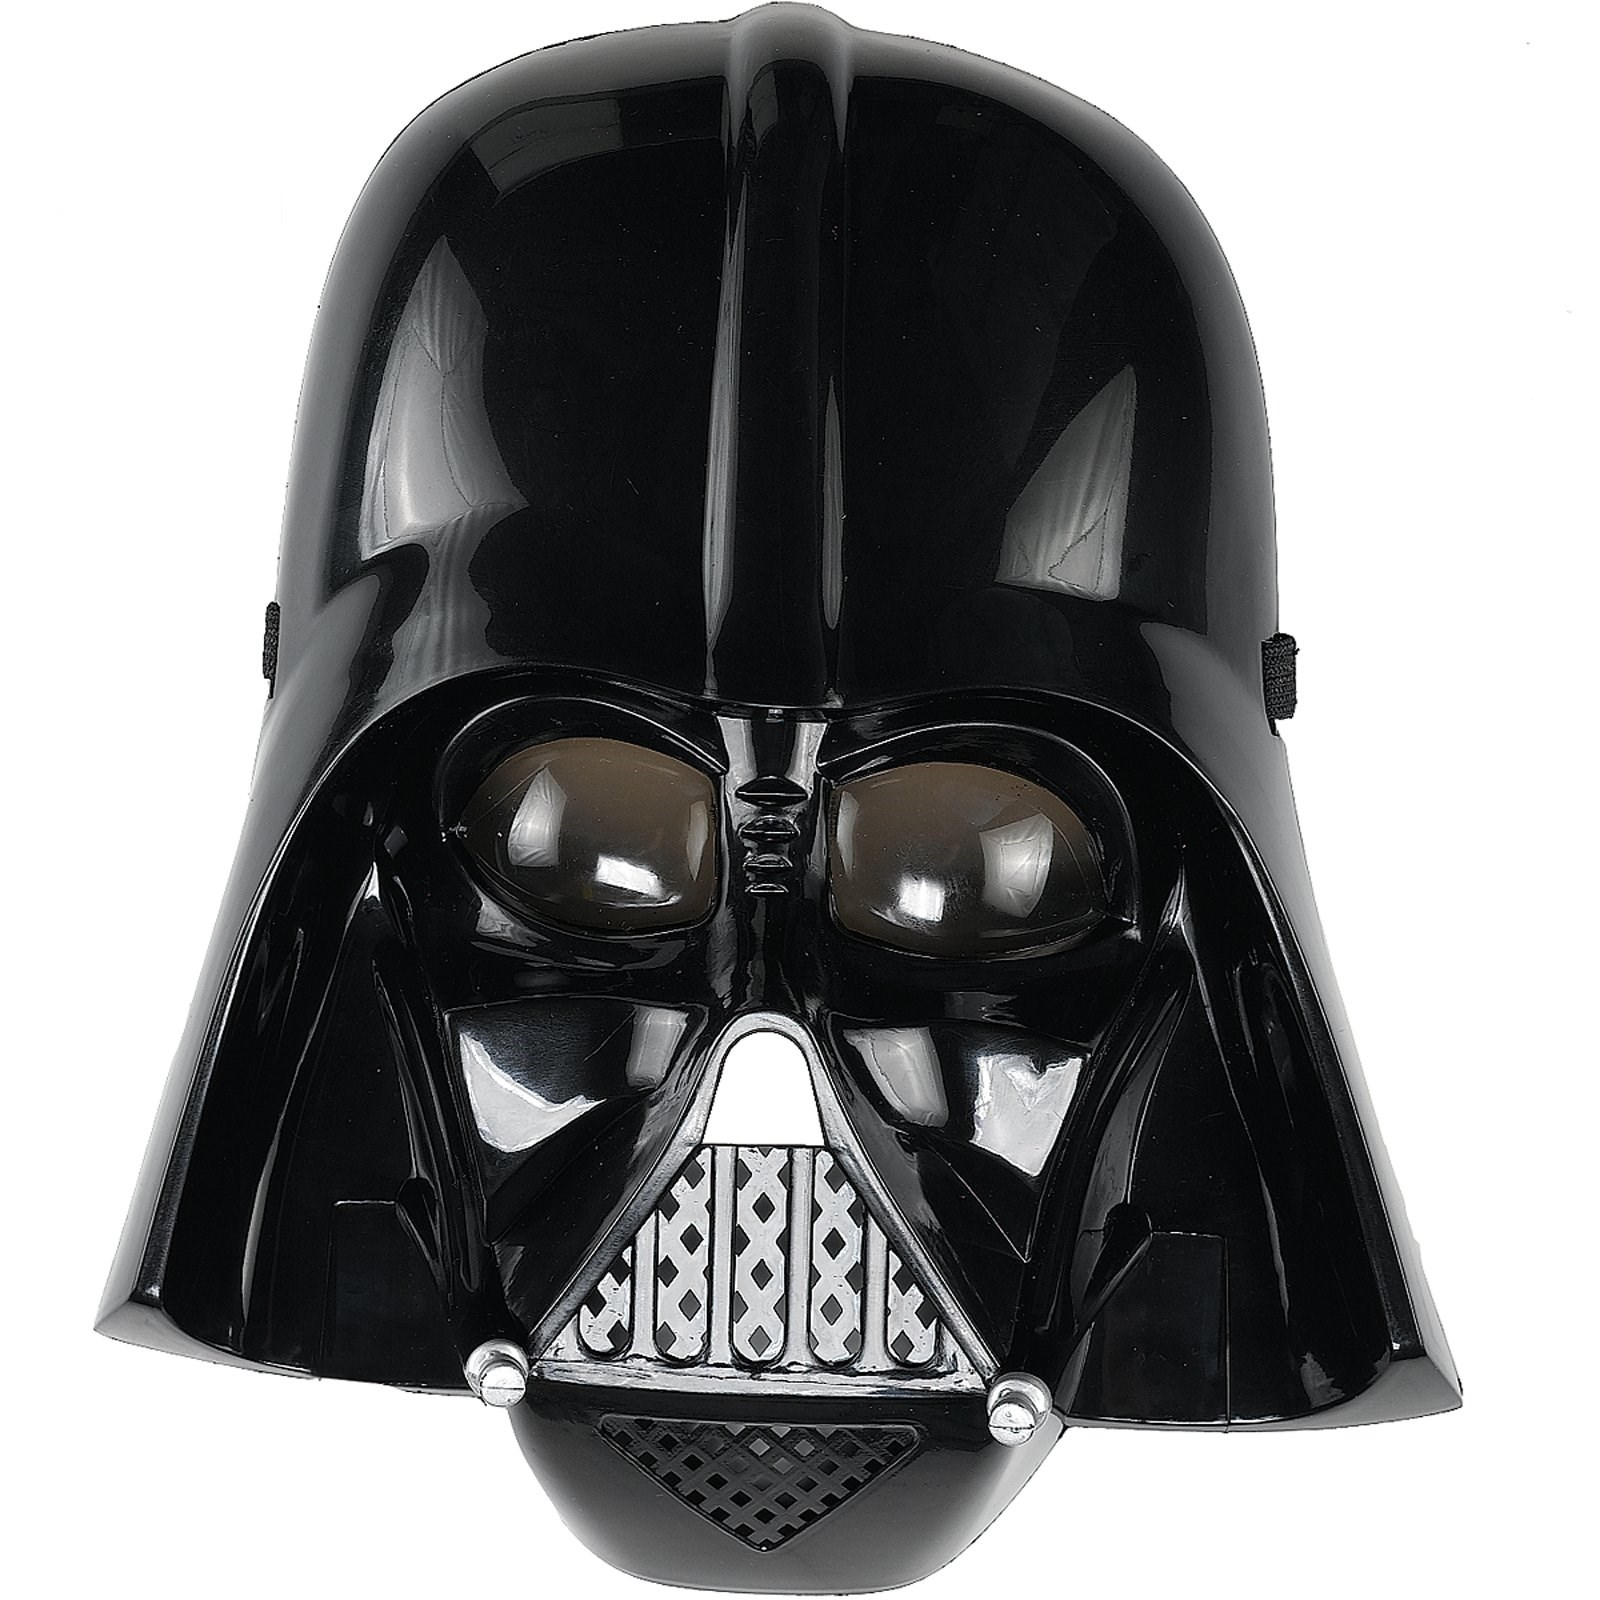 Star Wars: Darth Vader Mask